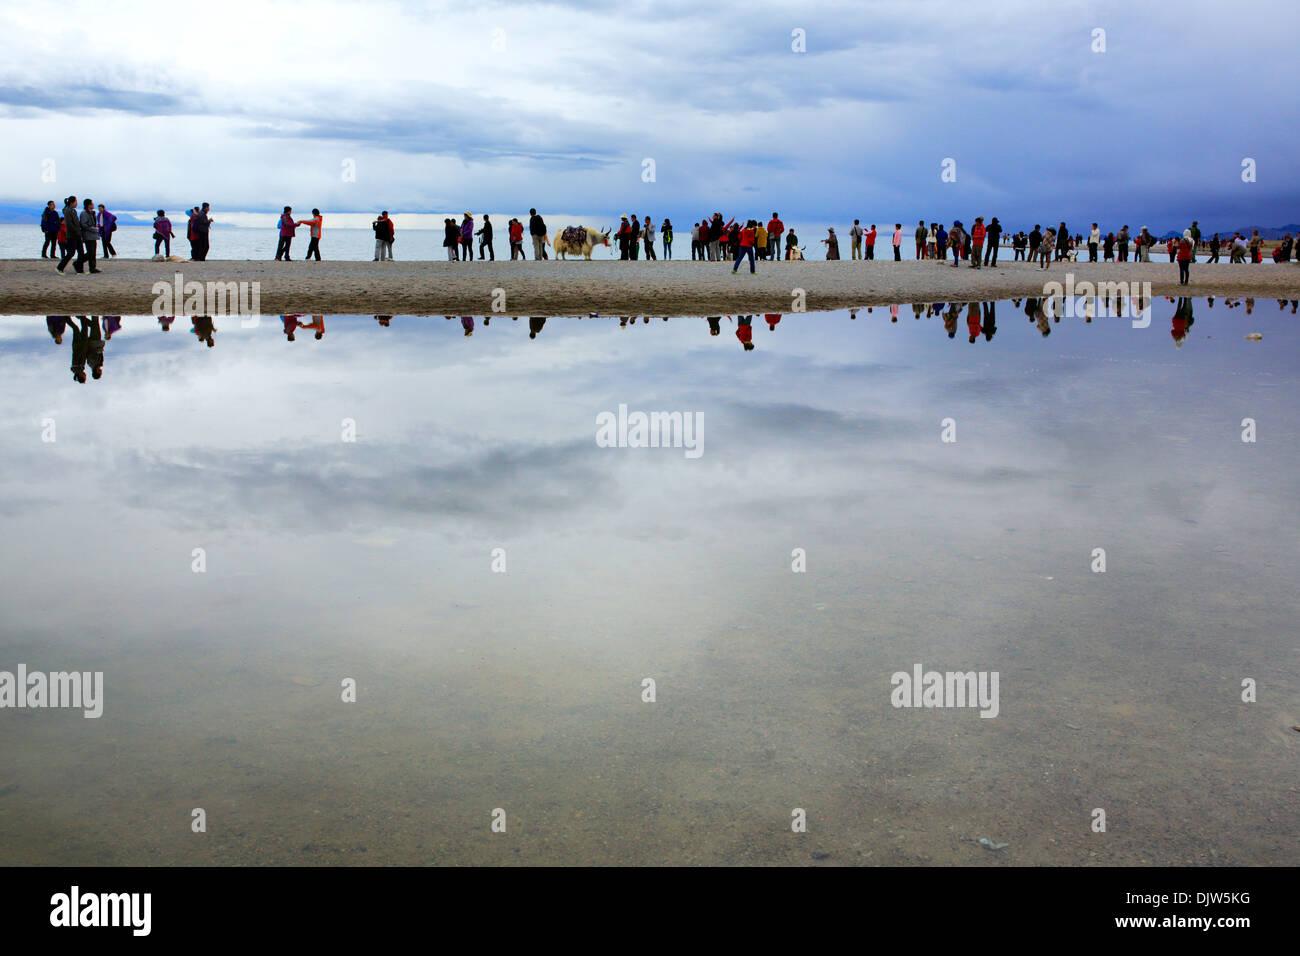 Namtso Lake (Nam Co), Tibet, China - Stock Image